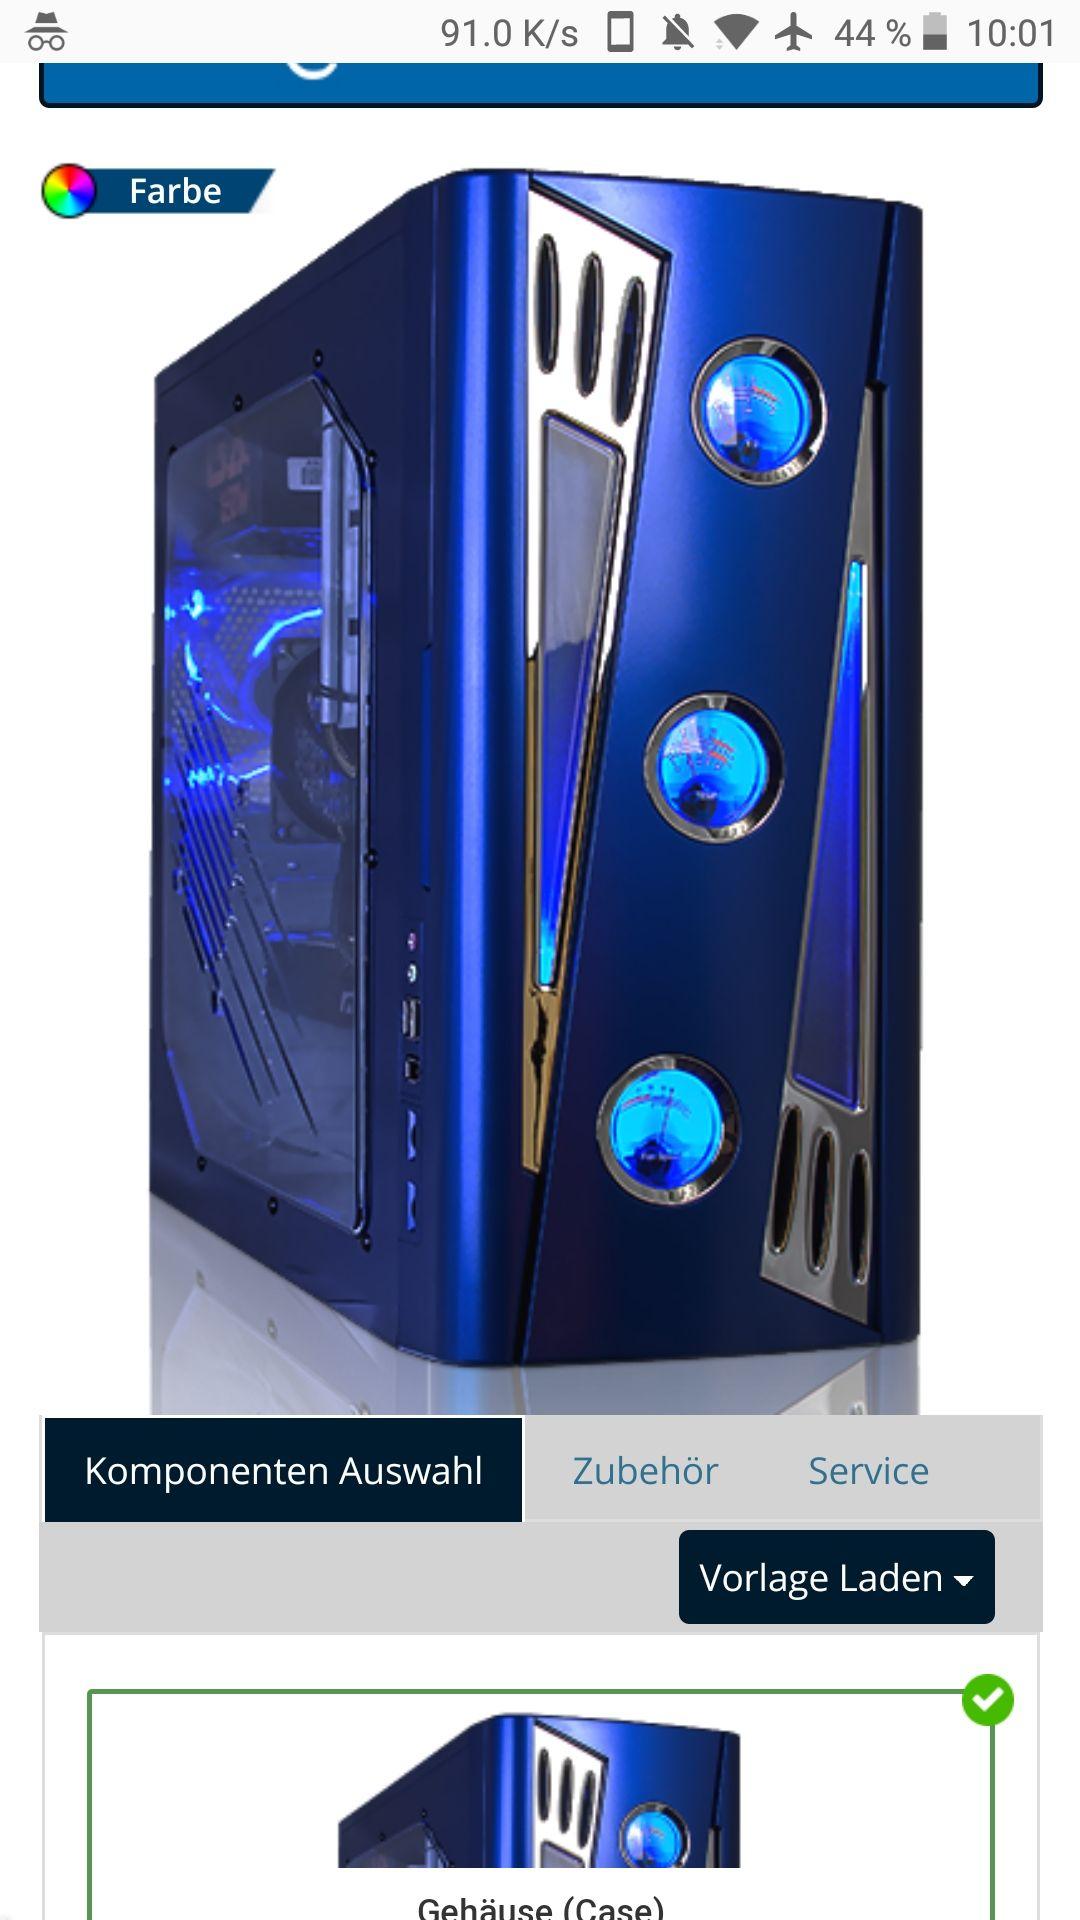 GAMING PC, RYZEN 5 2600X, RX 560, 8GB RAM, 1TB HDD, 600W BE QUIET NETZTEIL, WLAN, BELEUCHTUNG, DVD BRENNER